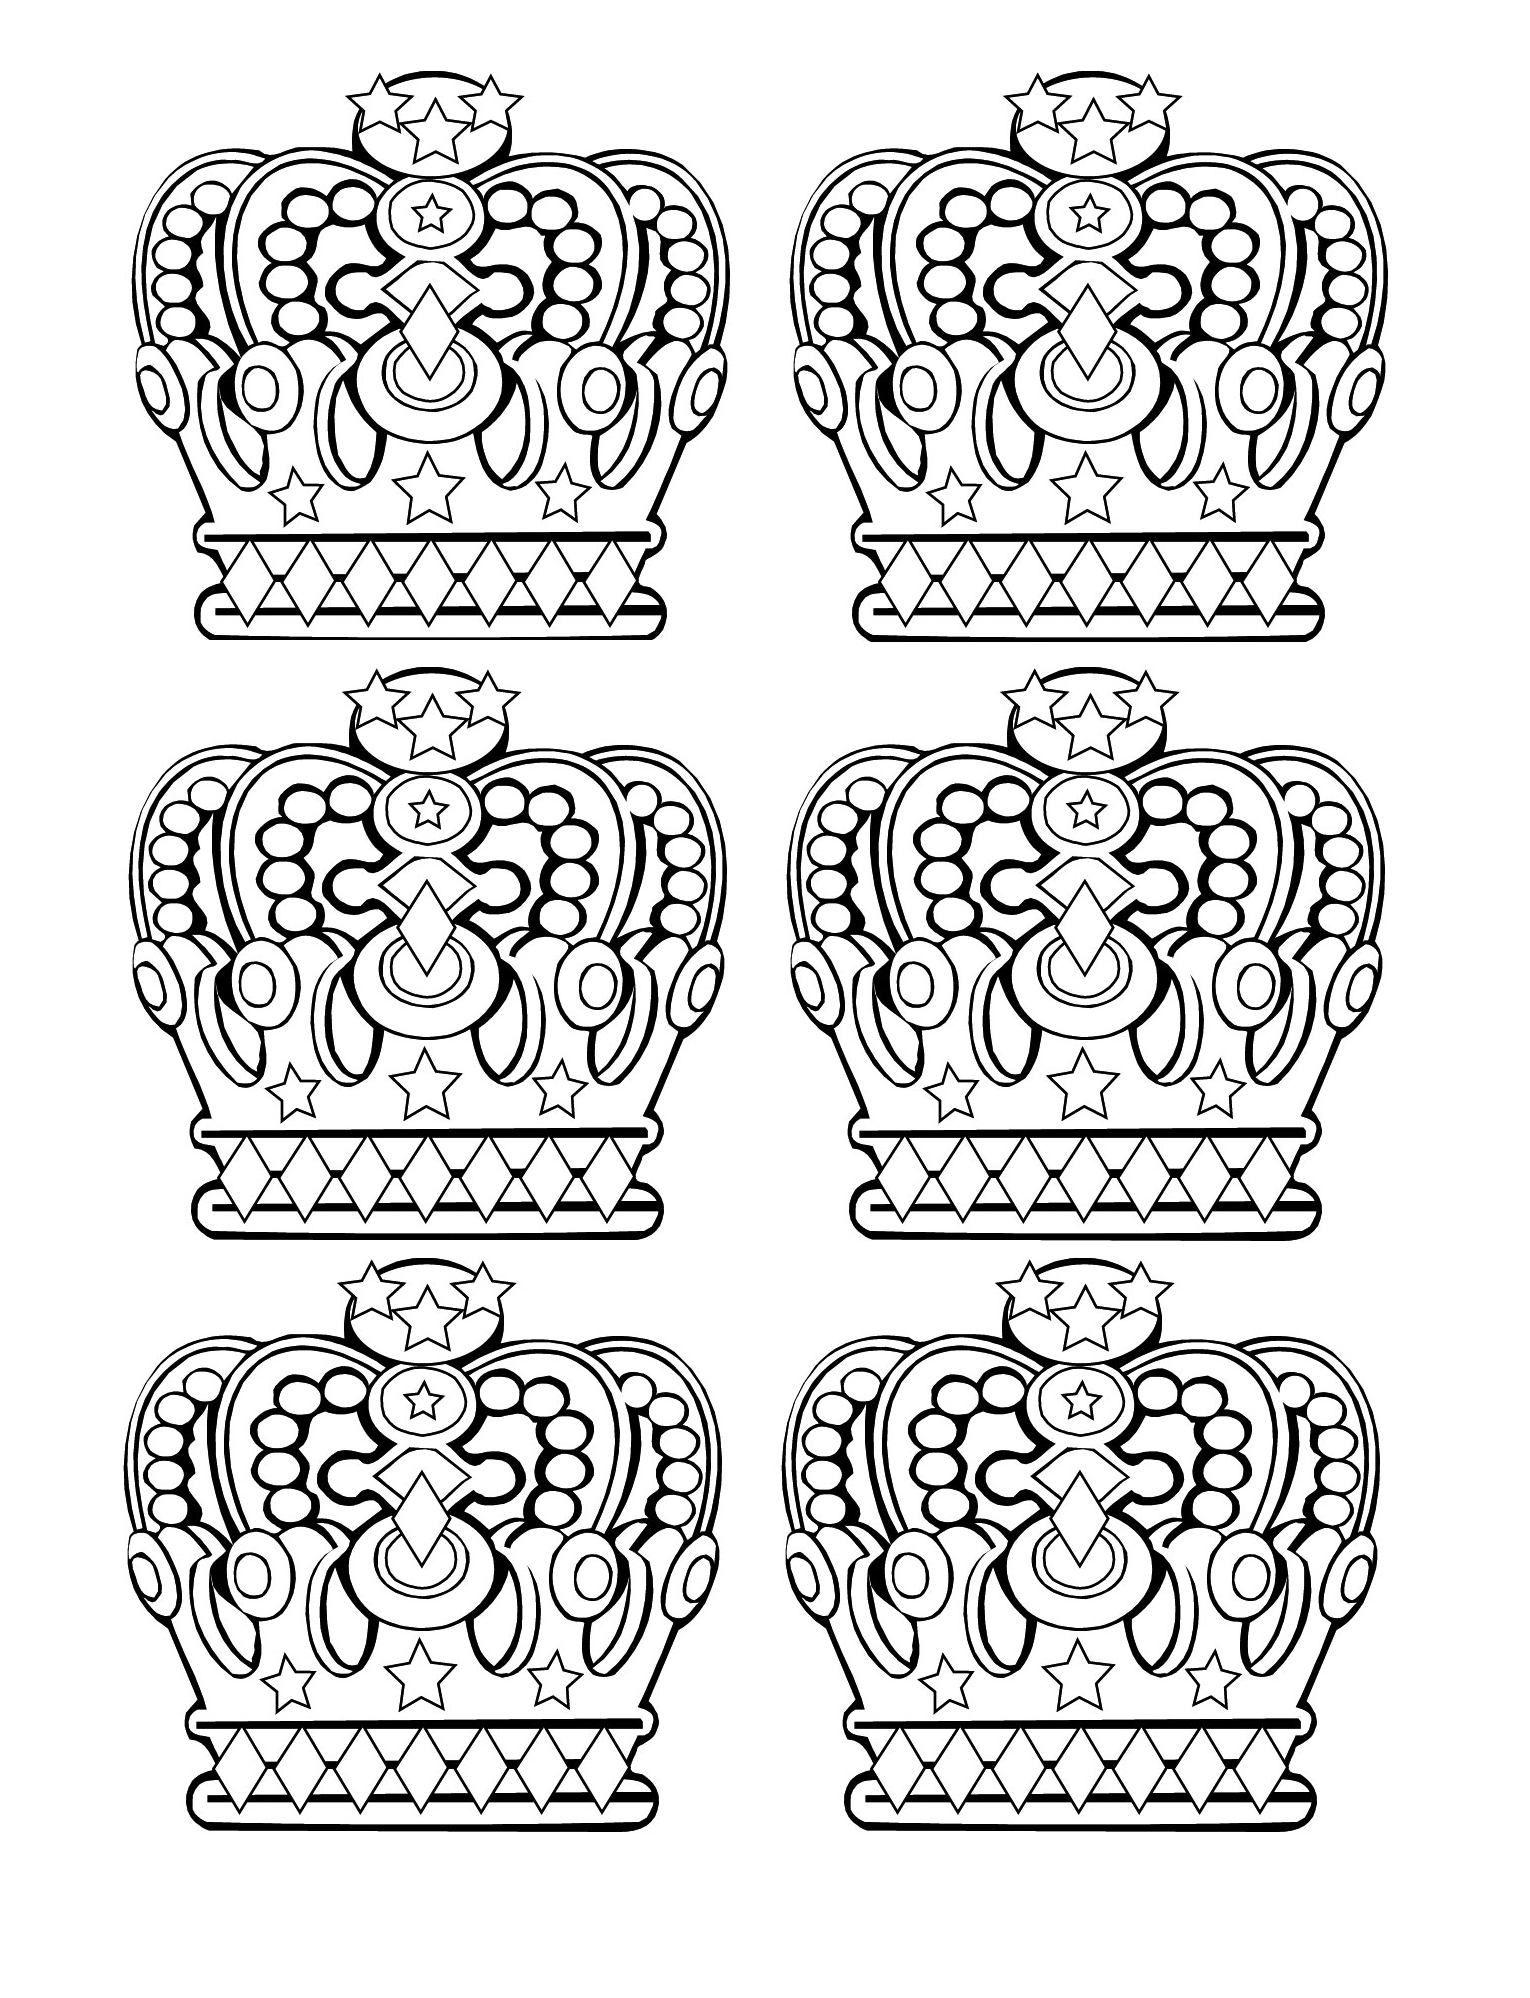 Free Coloring Page Coloring 6 Royal Crowns Royal Crowns 6 Patterns